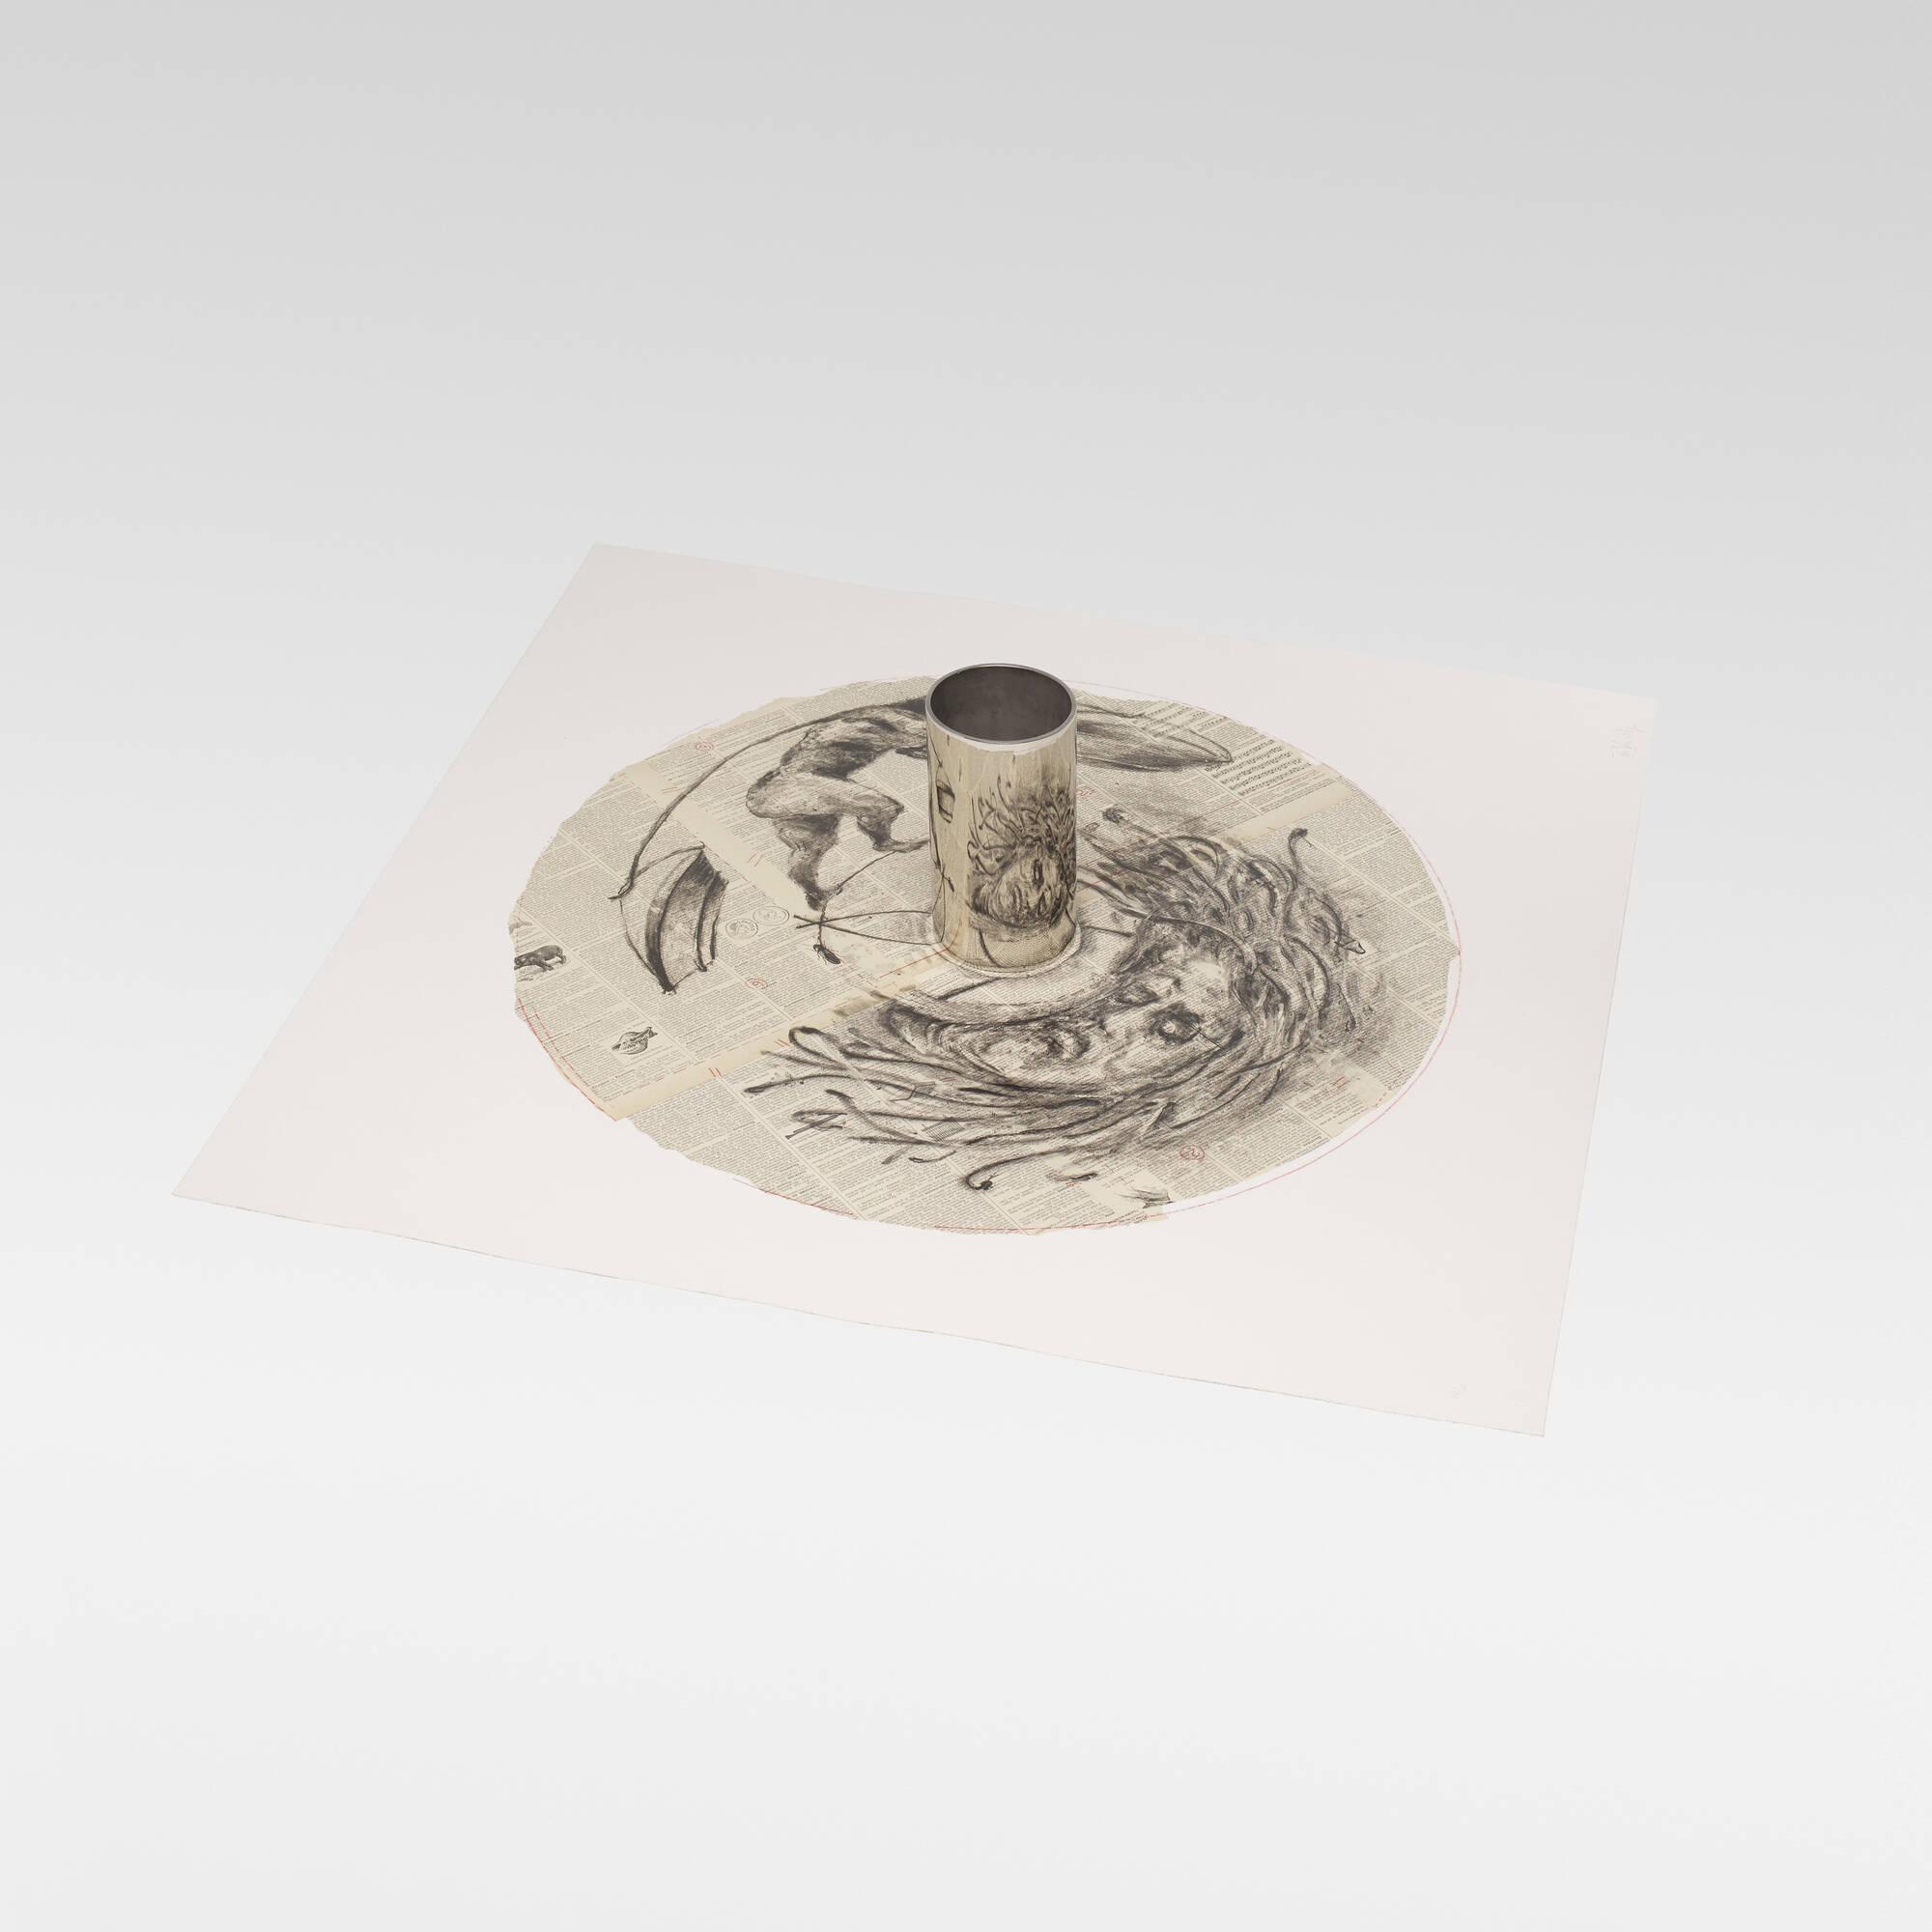 208: William Kentridge / Medusa (1 of 3)